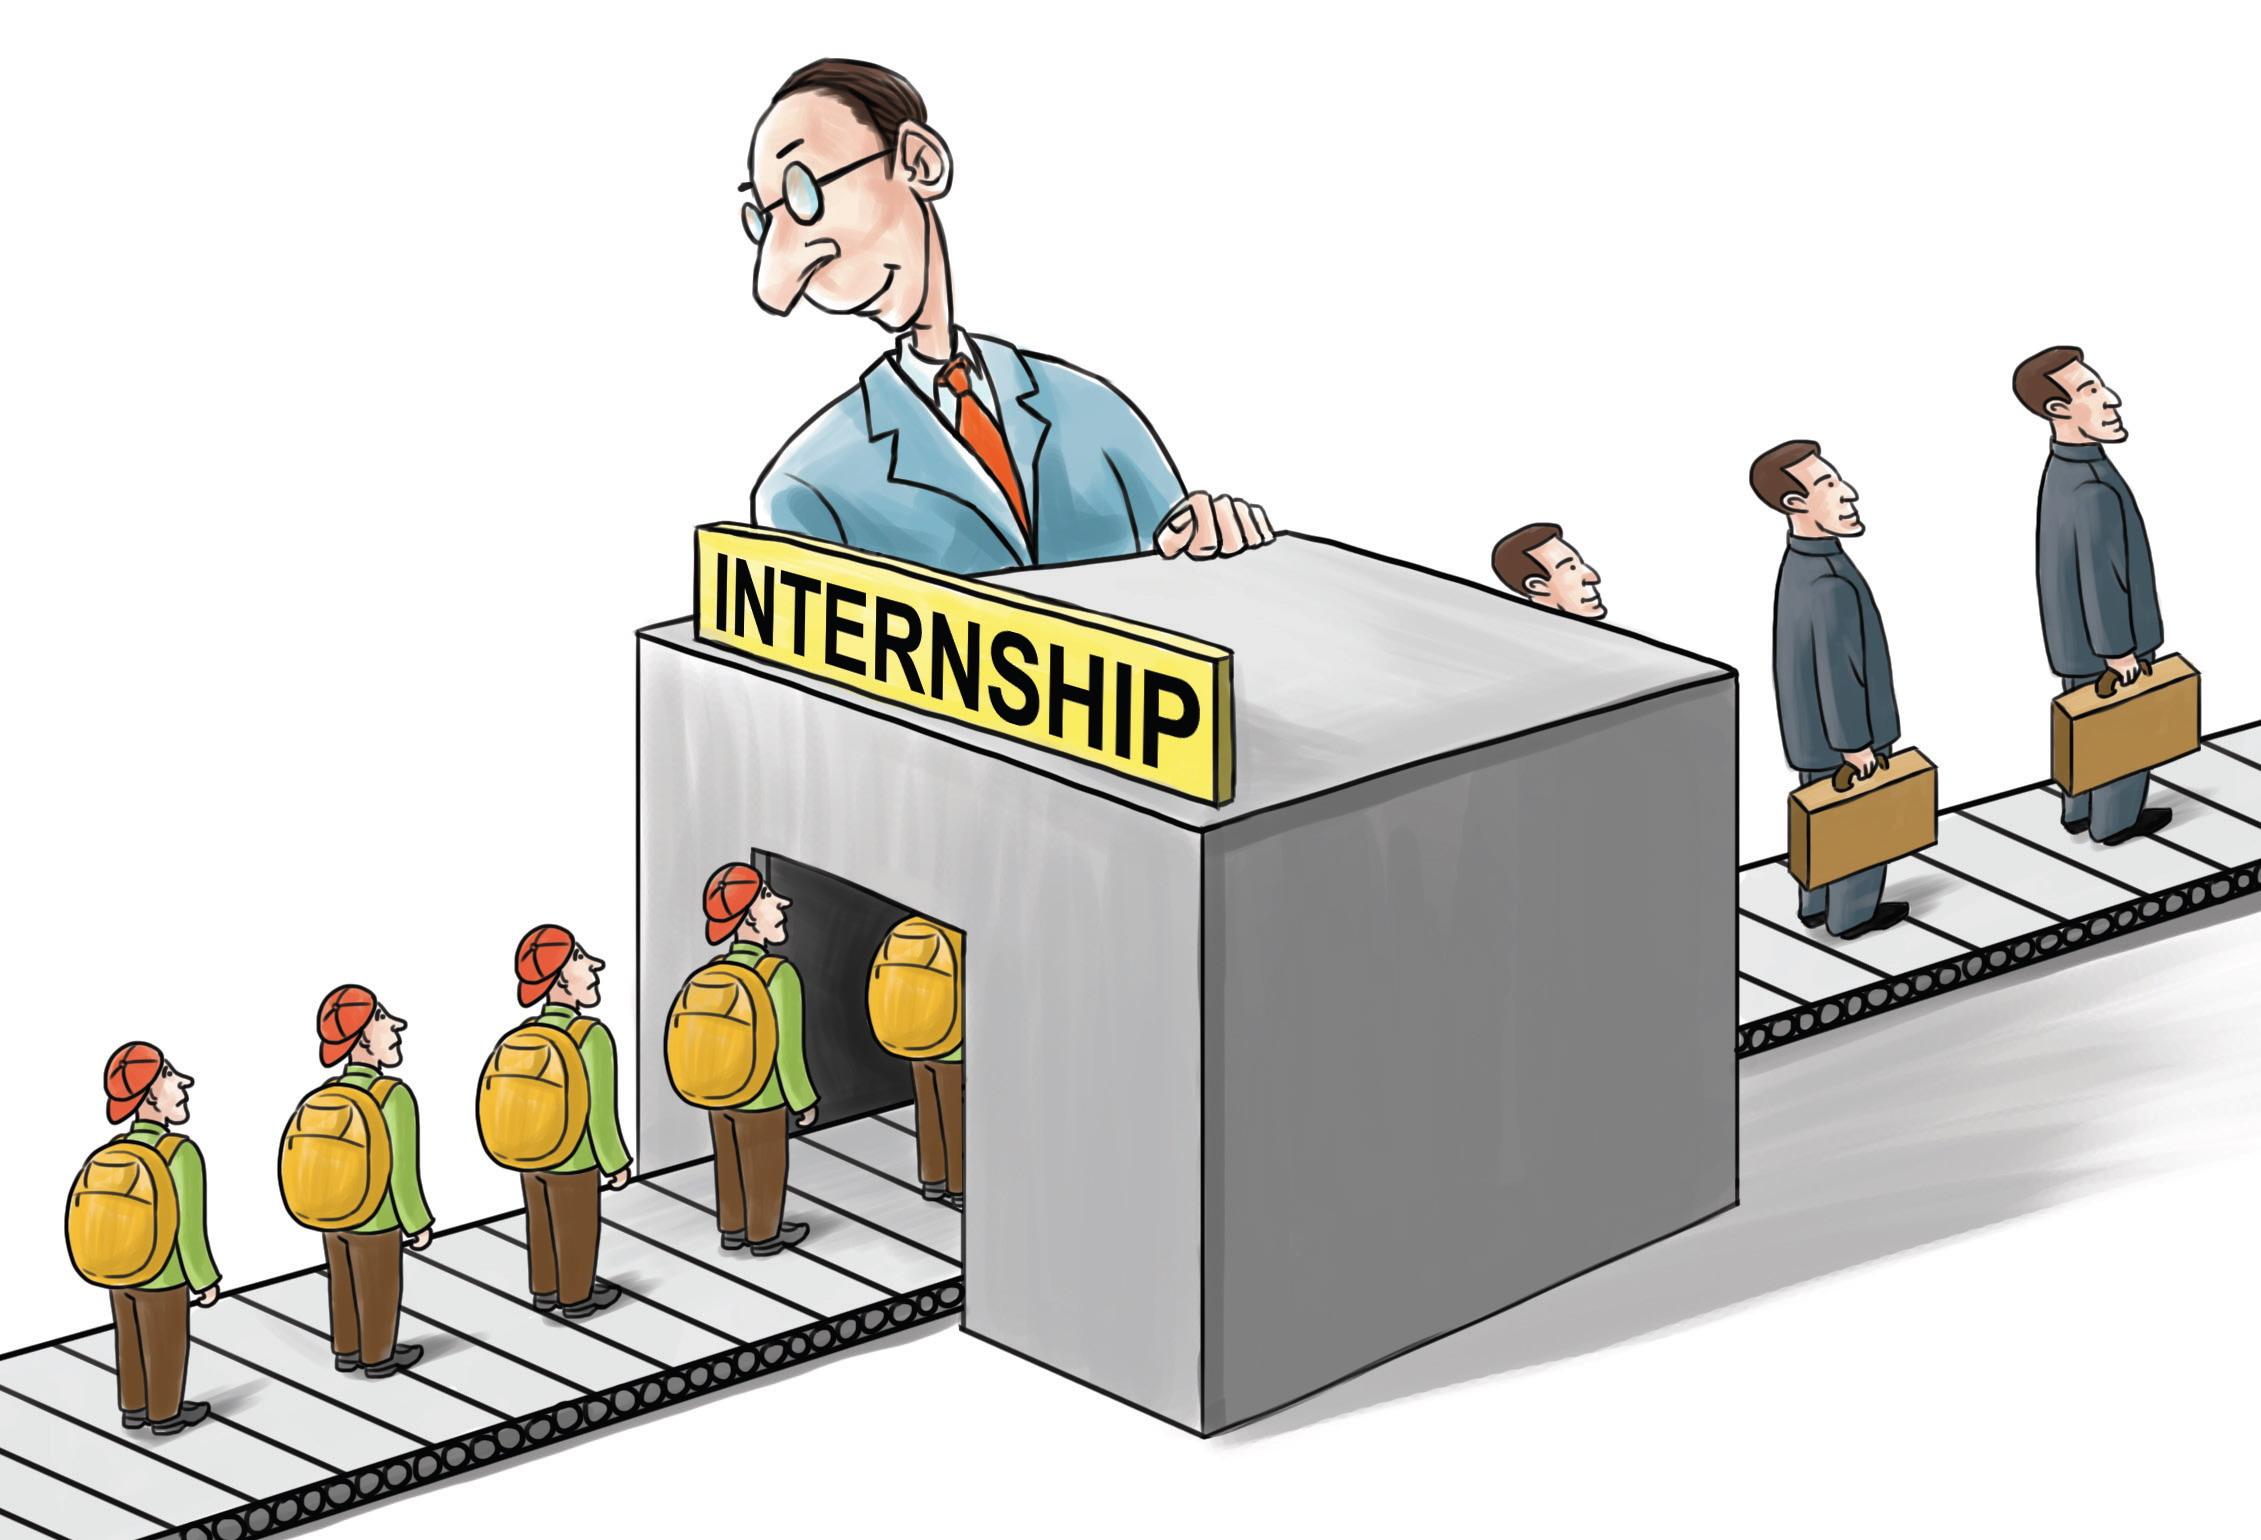 (source: job-mentor.com)